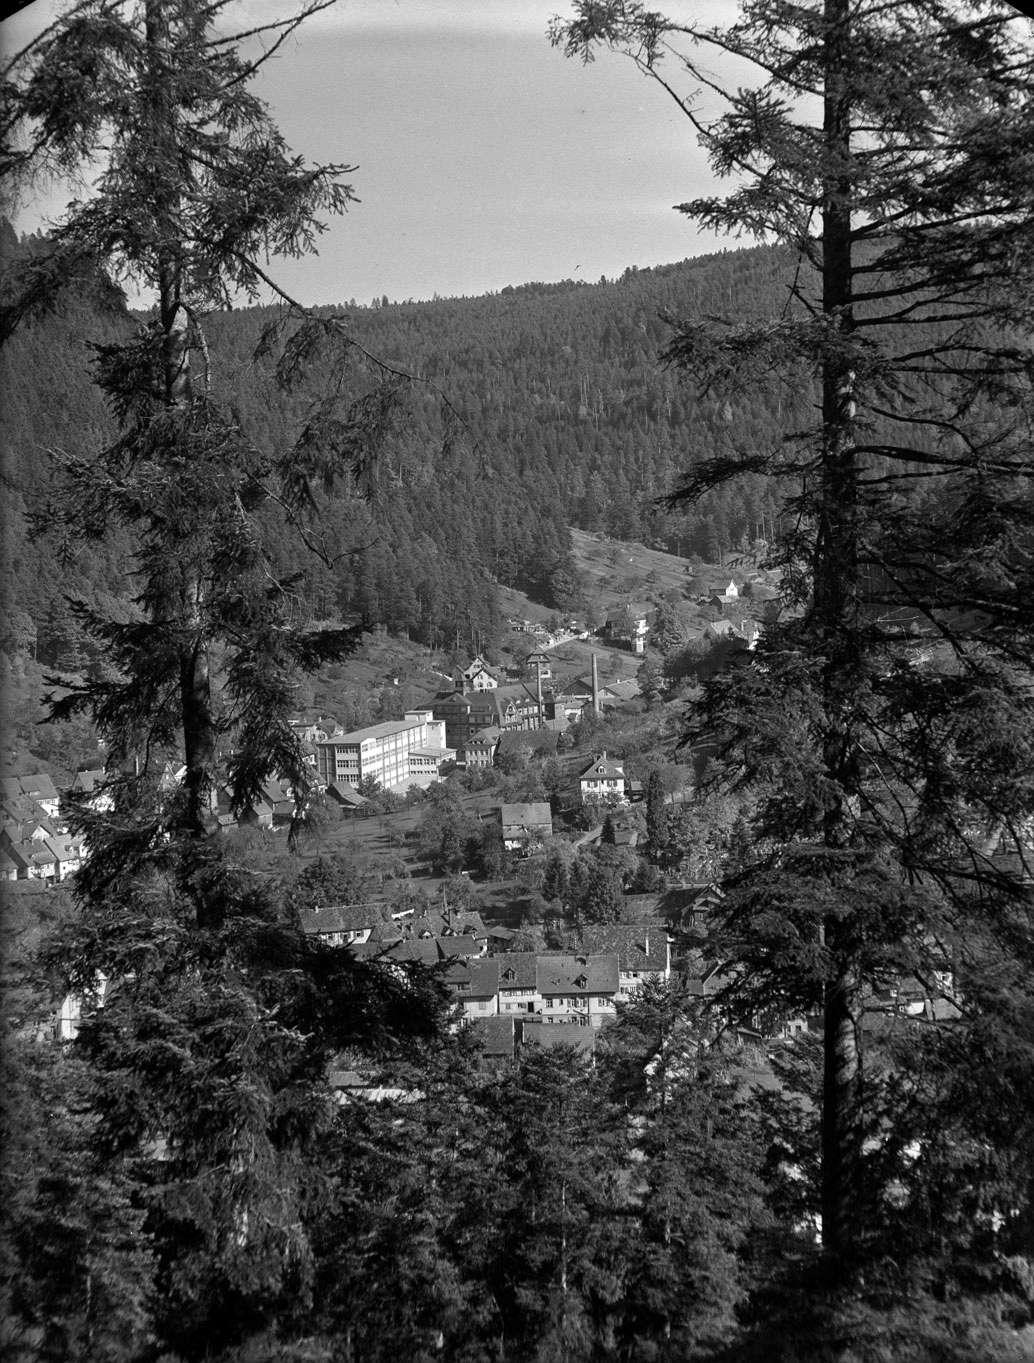 Dokumentation Wildbad und Calmbach (2), Nr 001